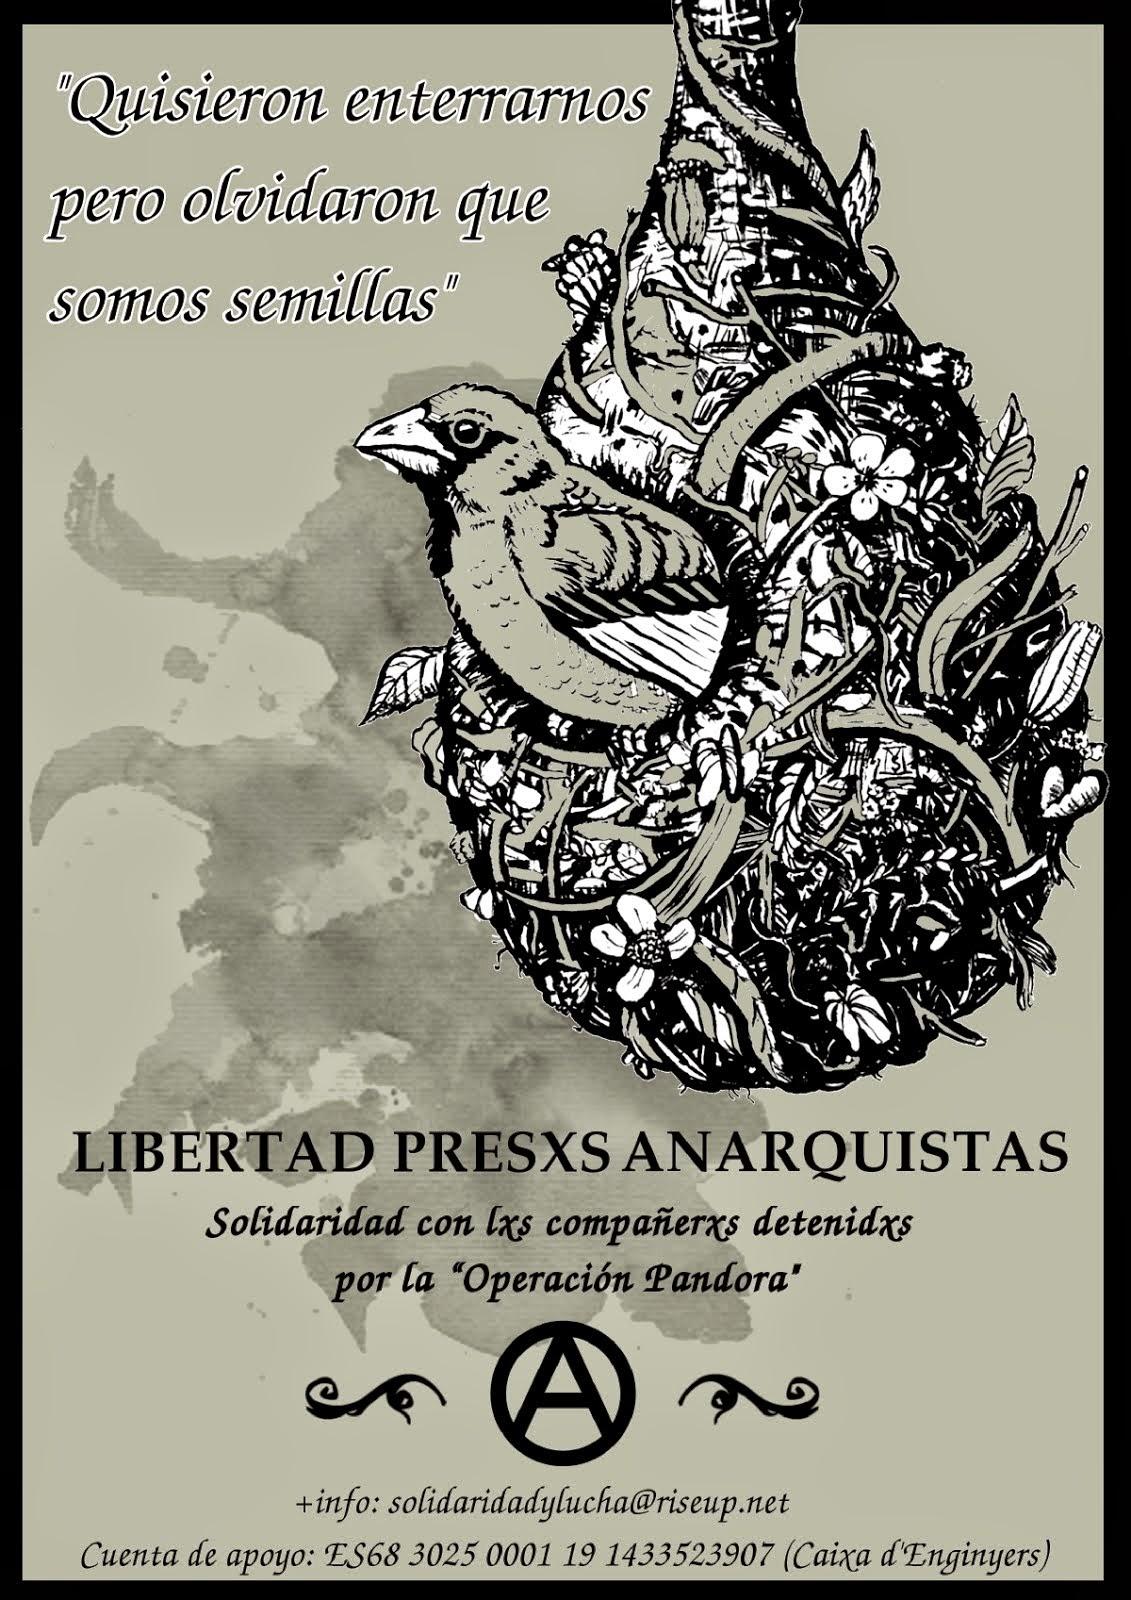 LIBERTAD PRES@S ANARQUISTAS